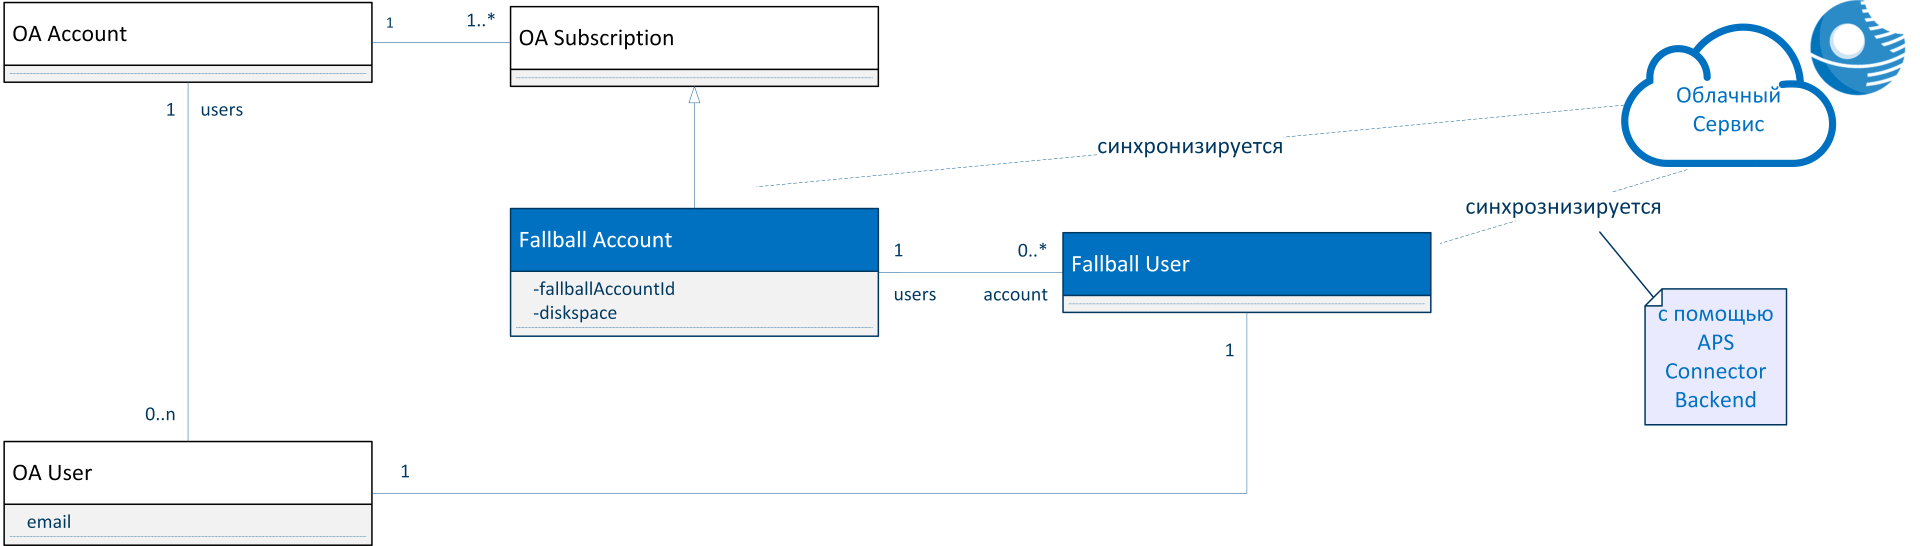 Технология APS: облачный стандарт - 7